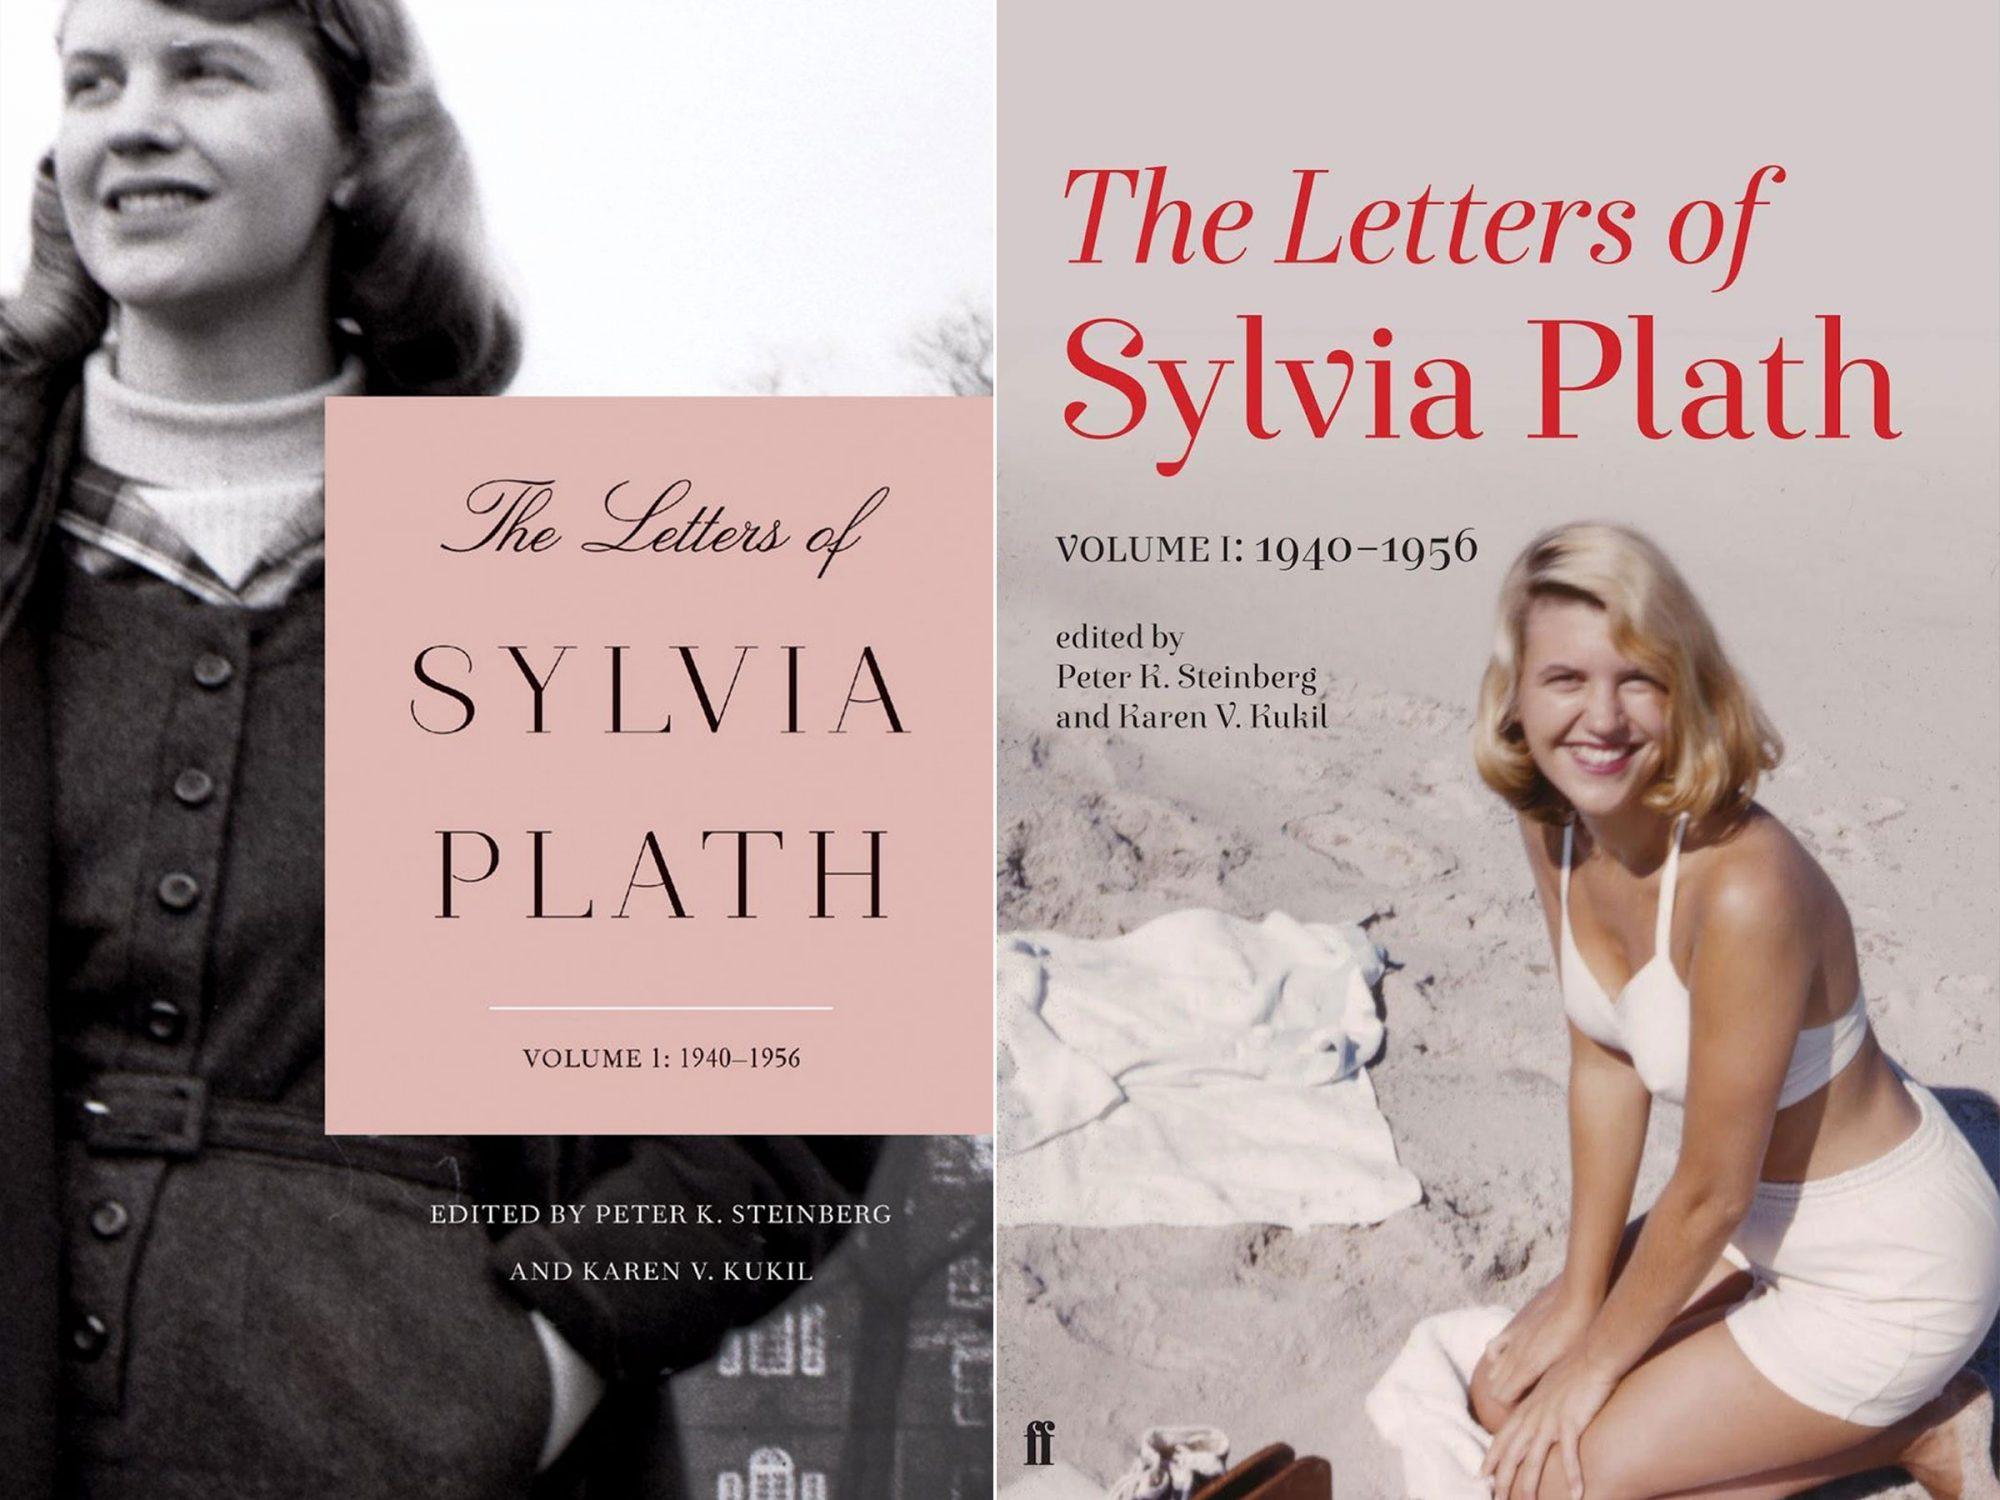 sylviaplathcovers